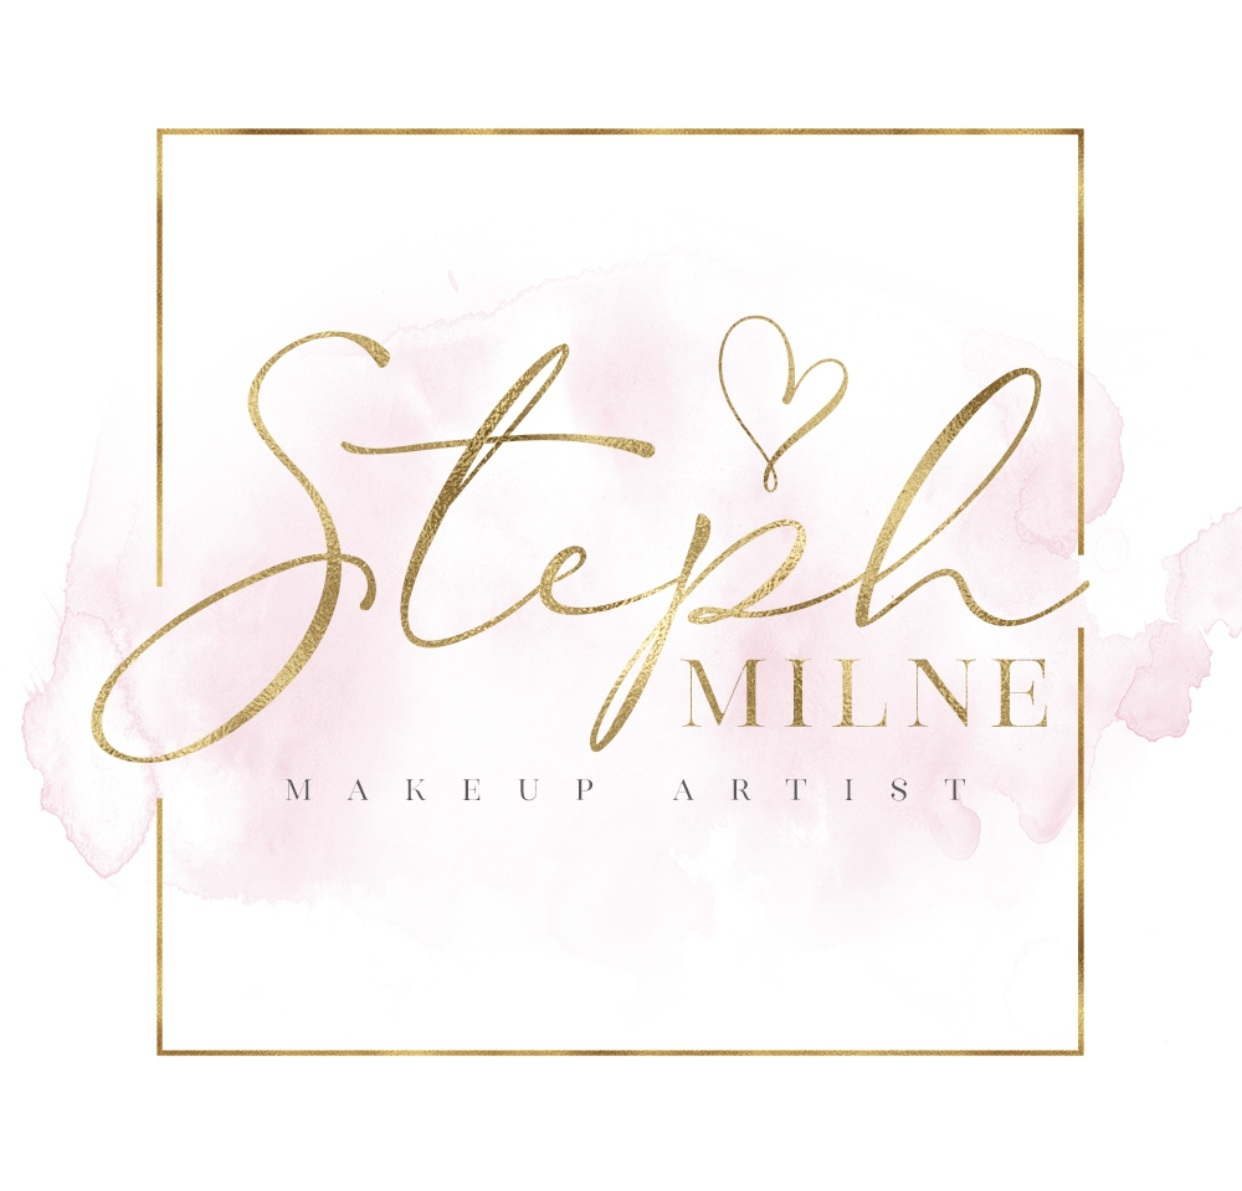 Steph Milne Makeup